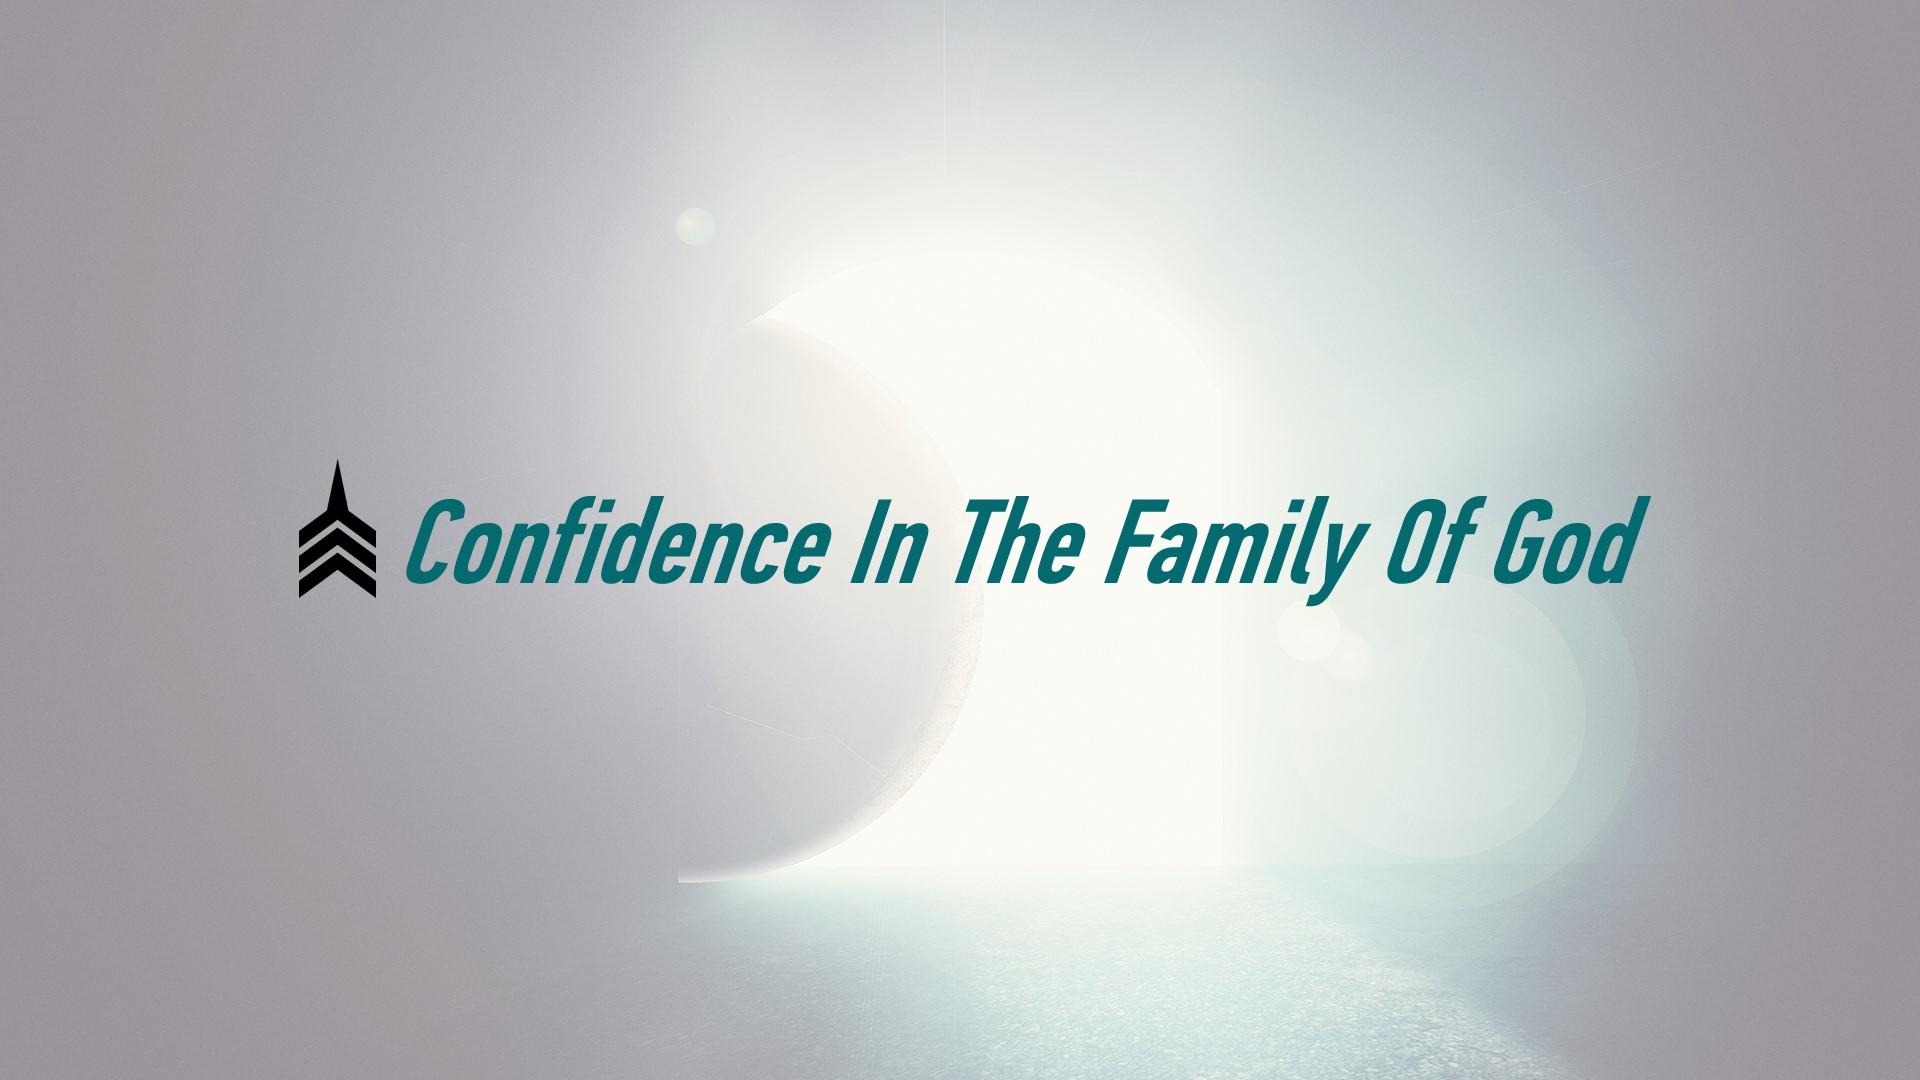 Confidence In The Family Of God.JPG